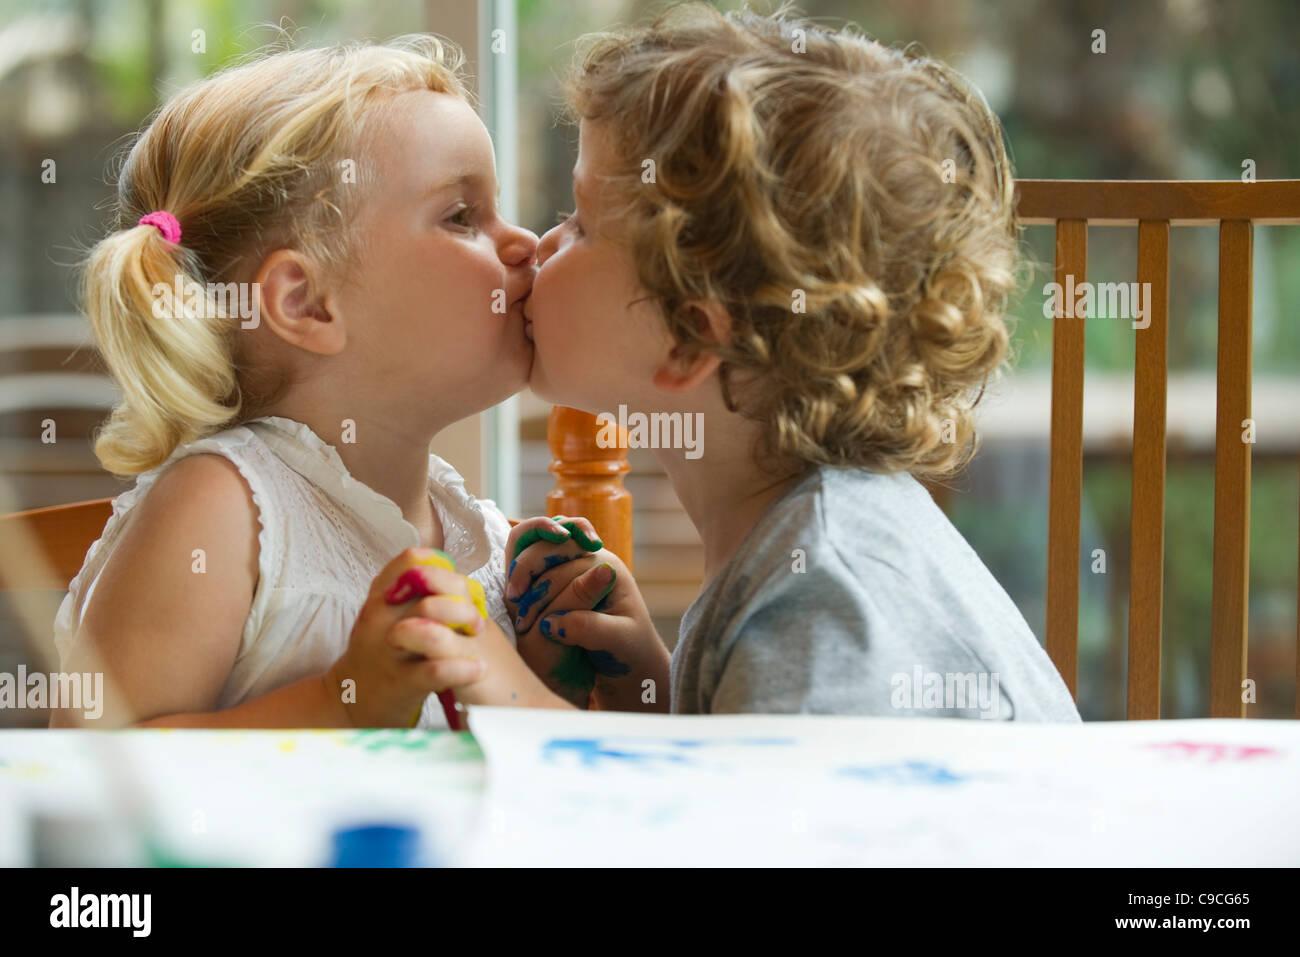 Young Boy Kissing Girls Hand Stock Photos Young Boy Kissing Girls